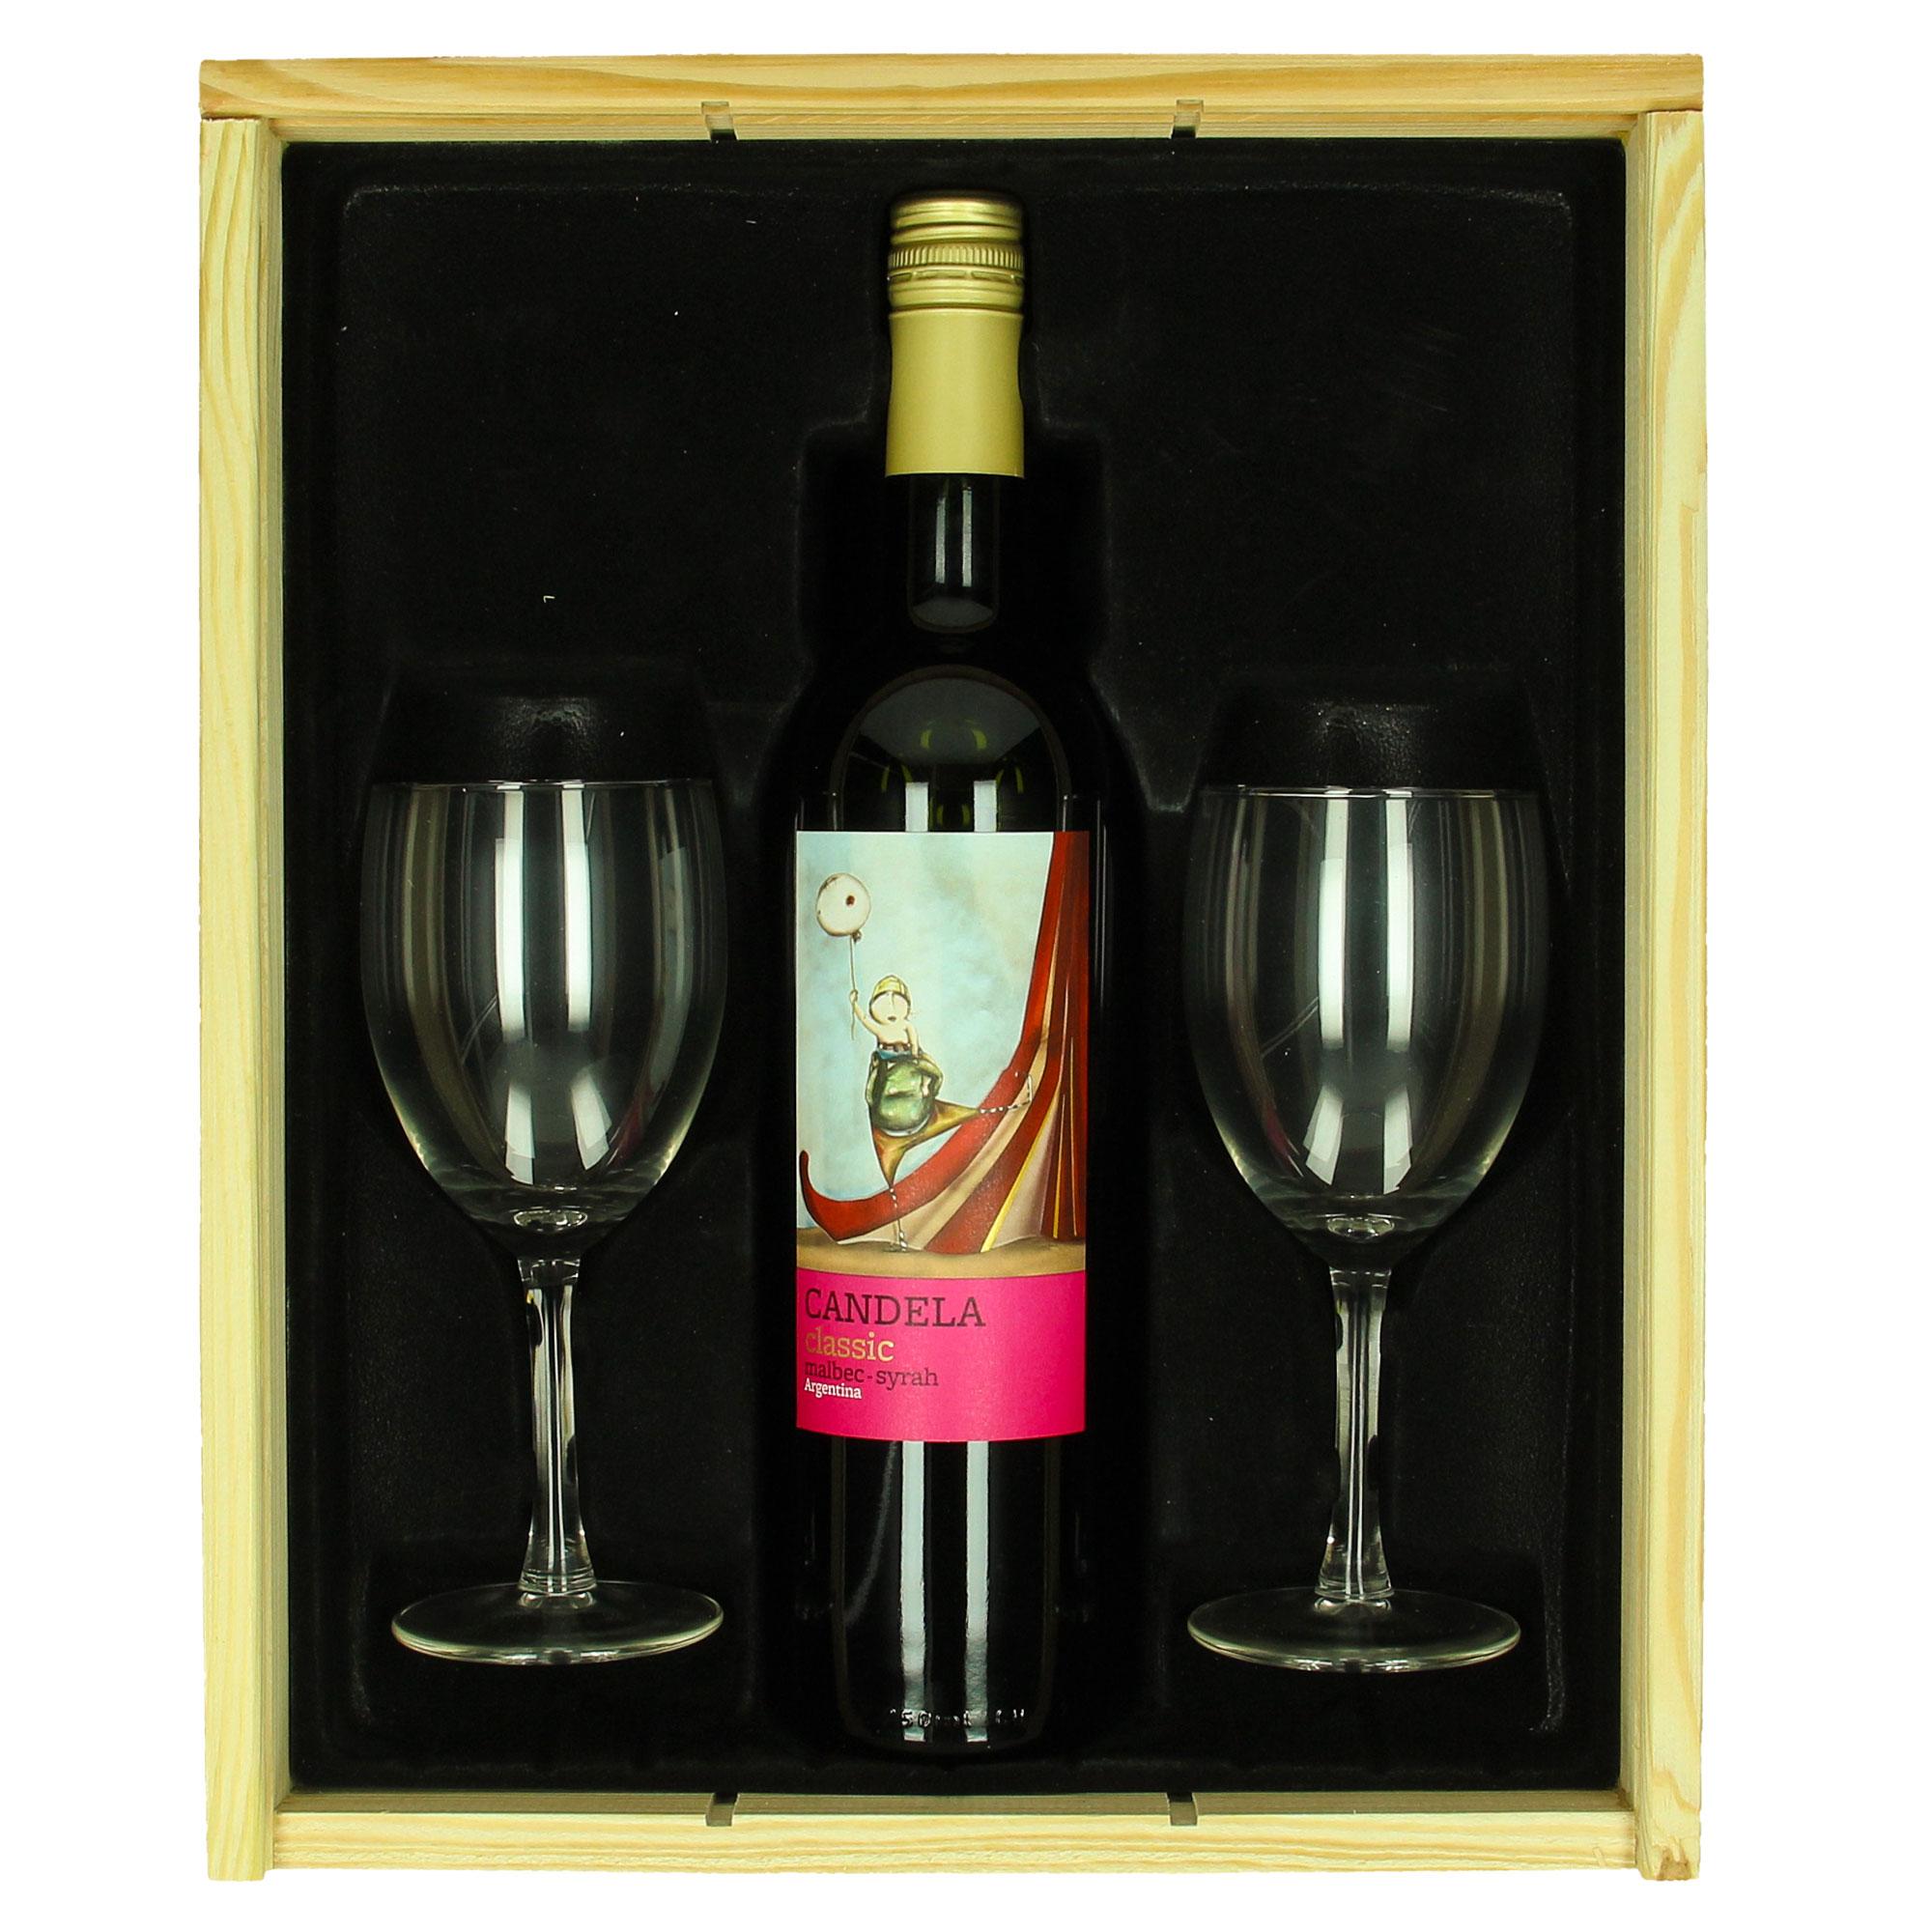 Coffret de vin Candela Malbec + verres personnalisés